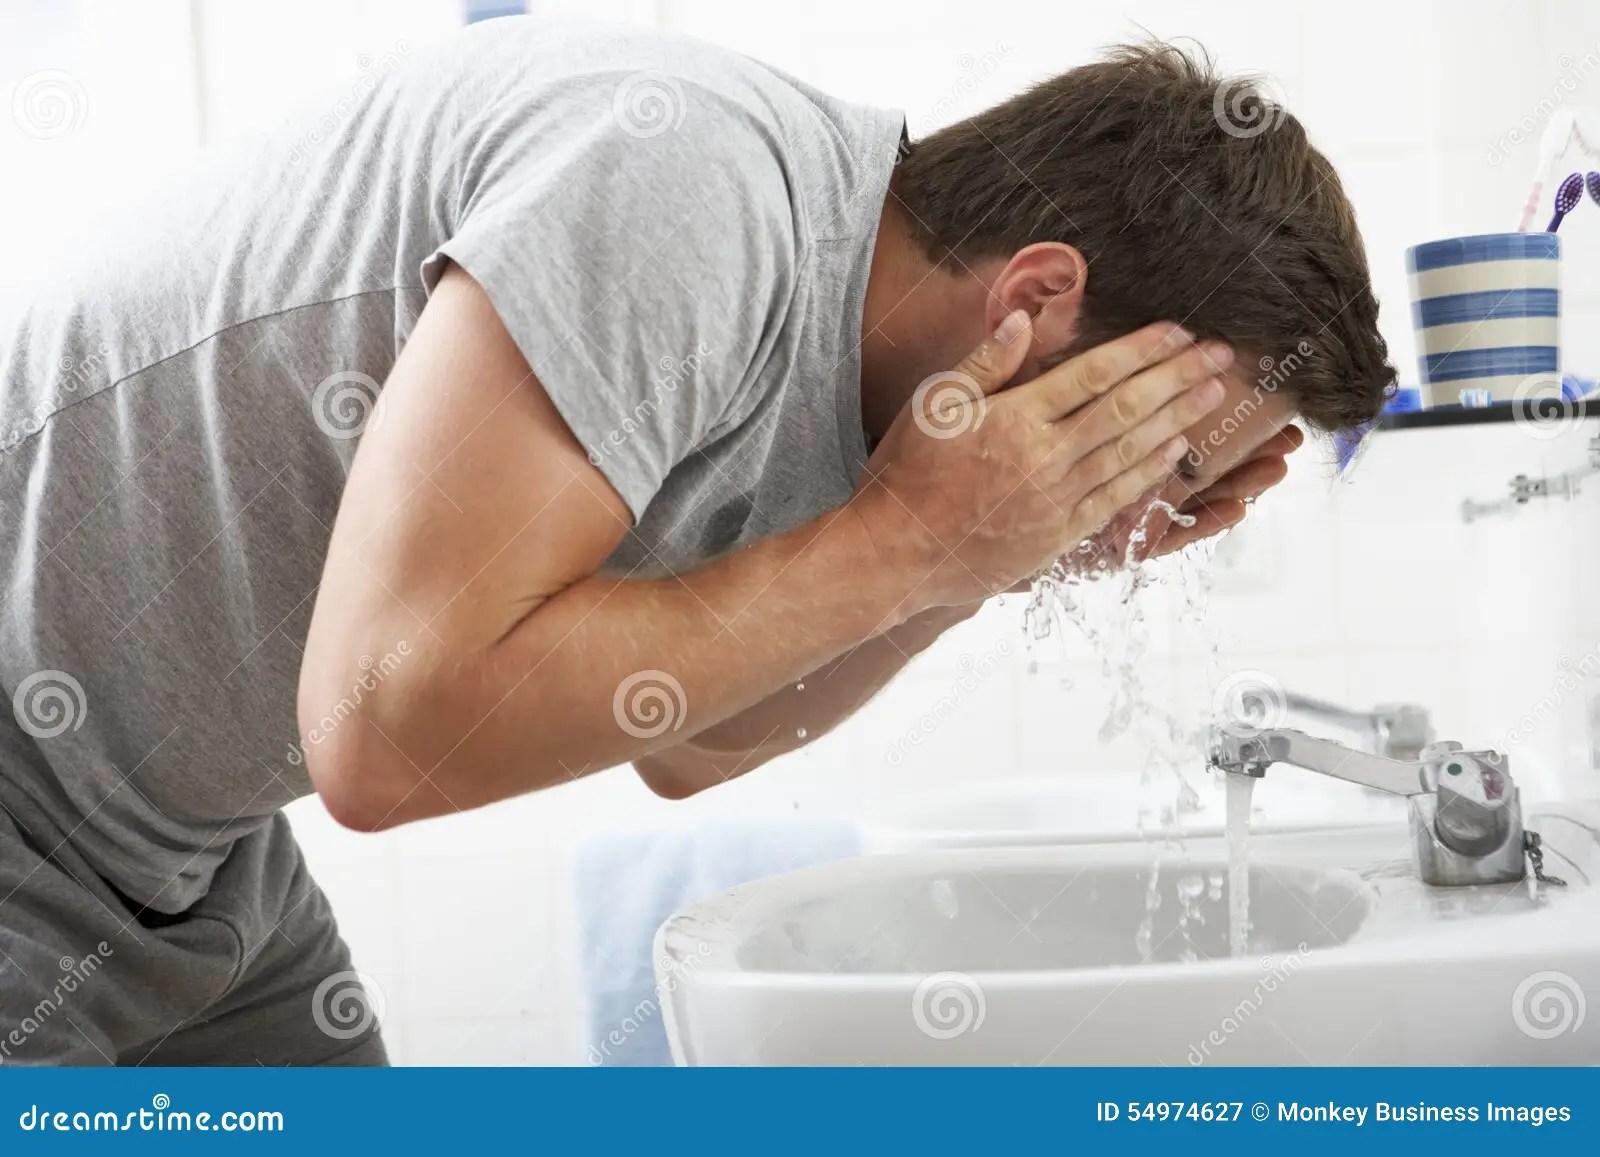 Man Washing Face In Bathroom Sink Stock Photo